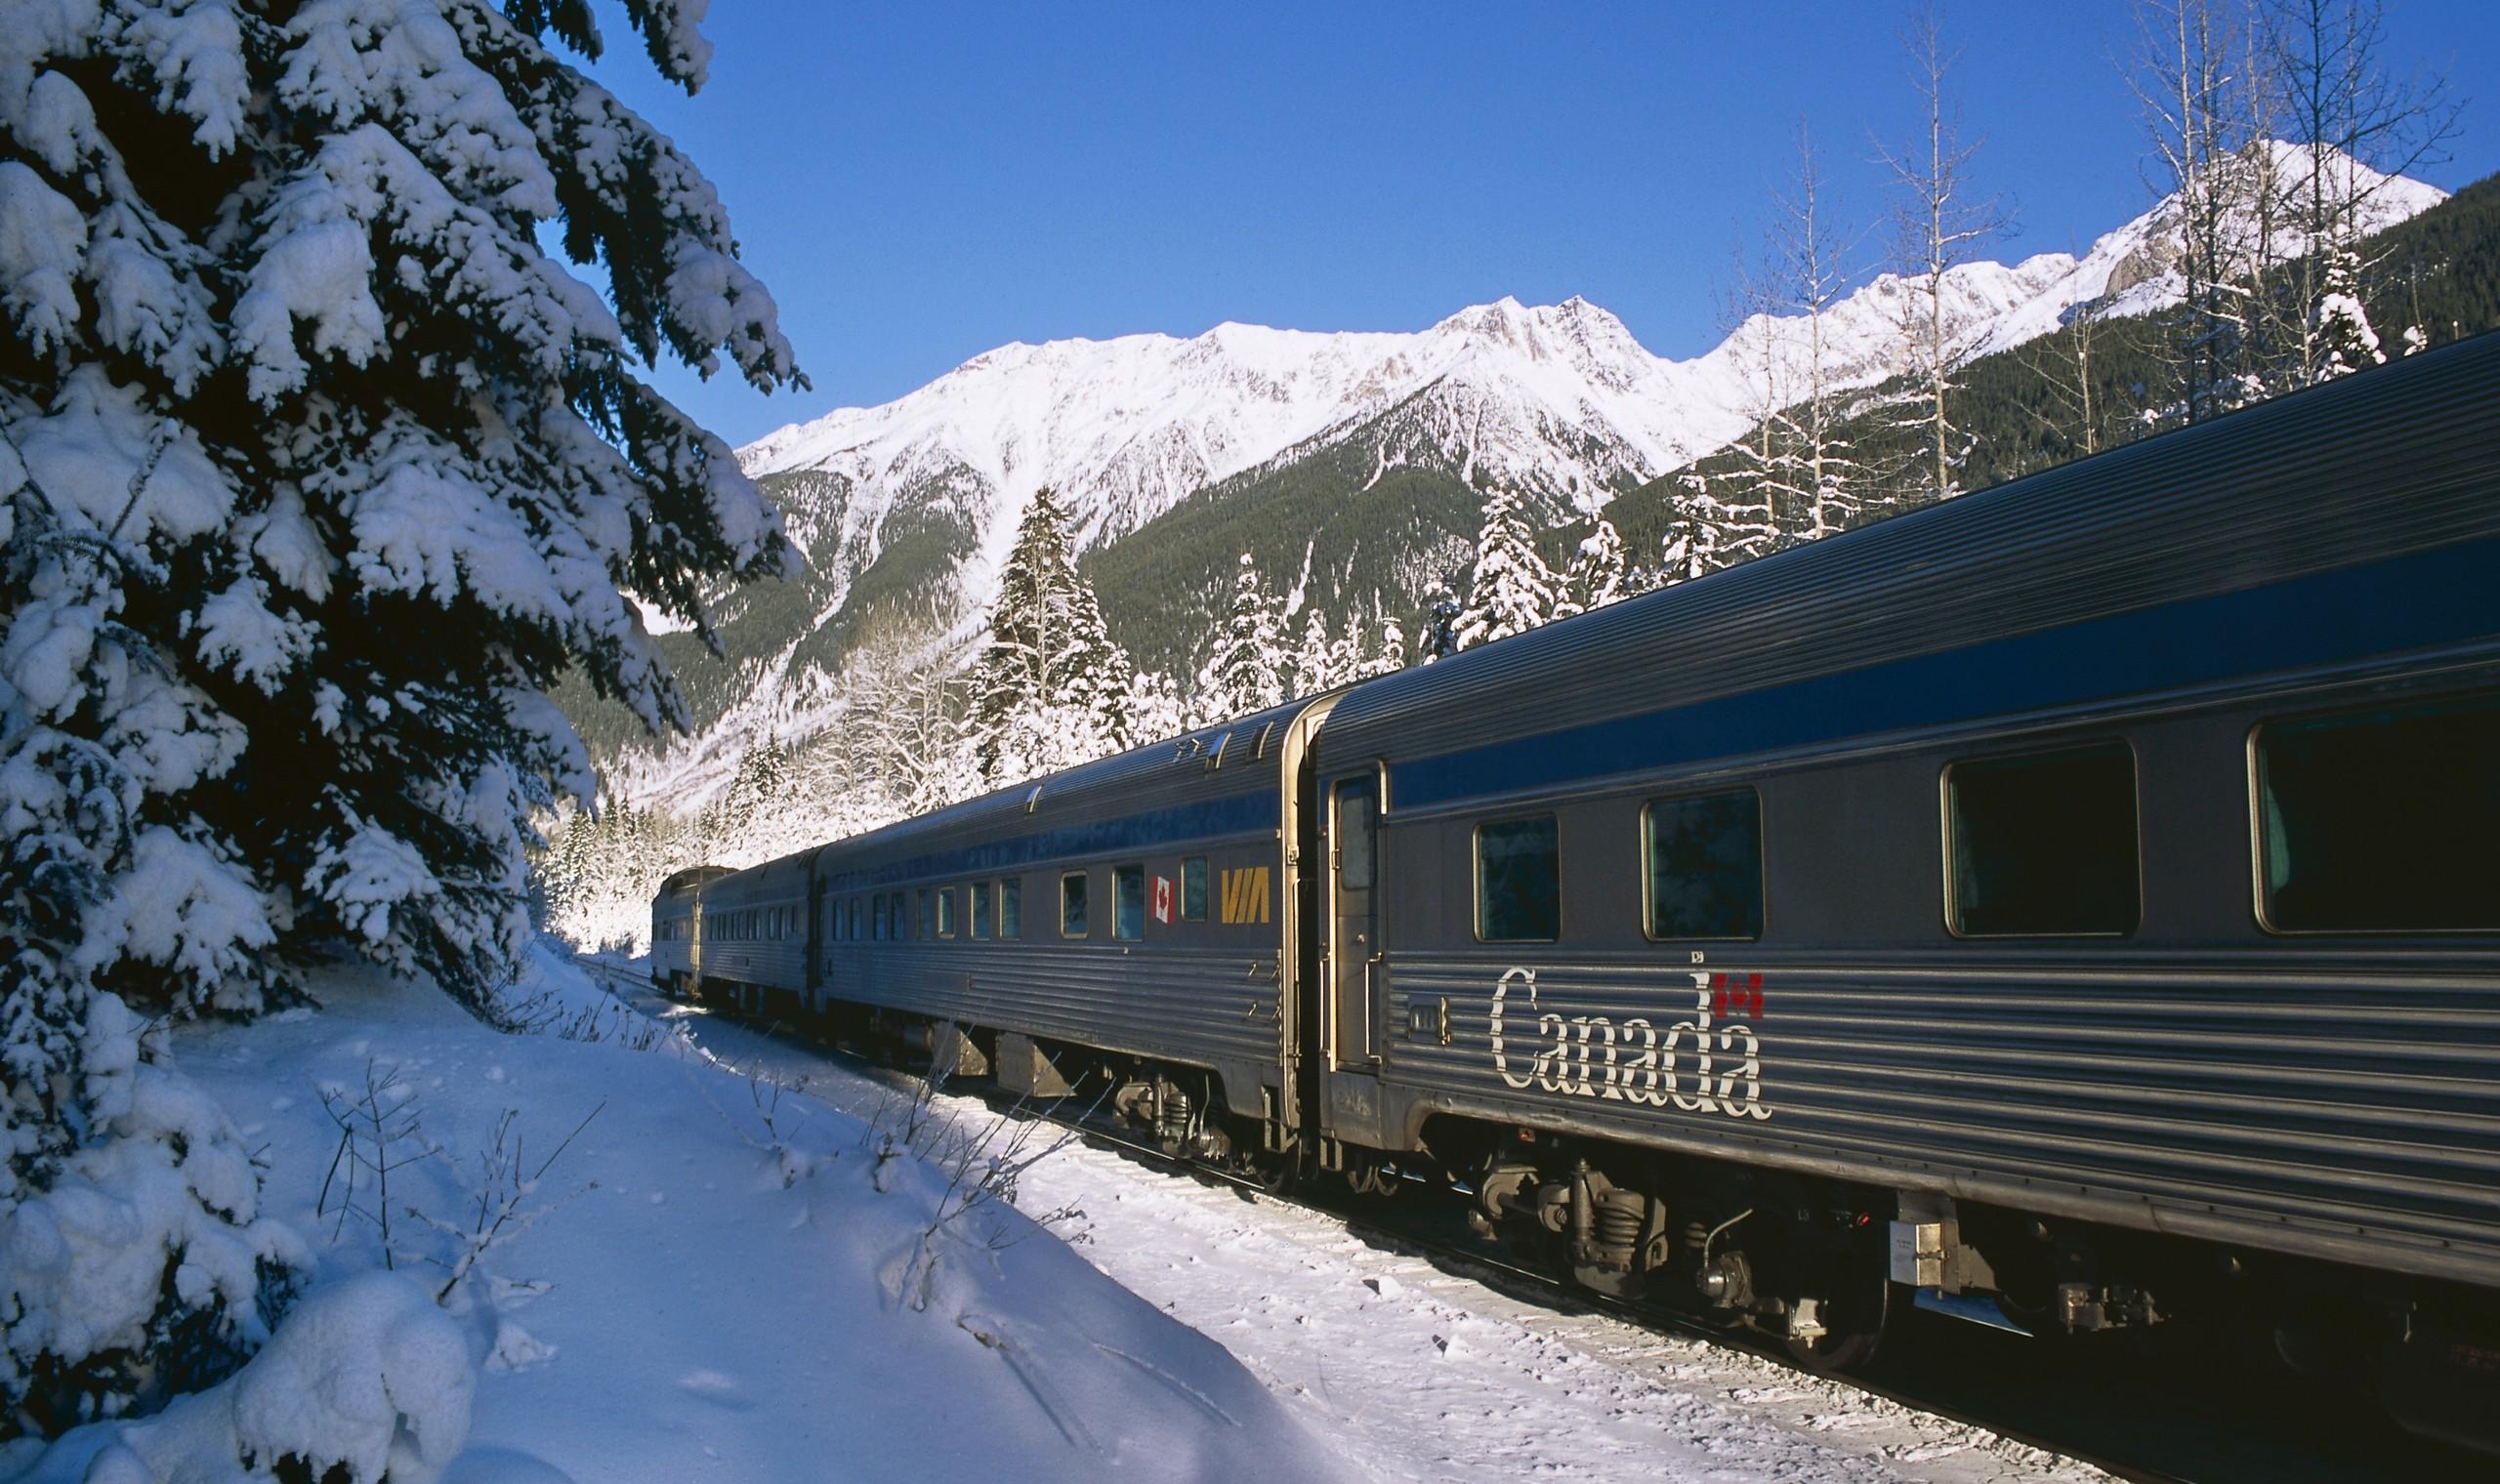 Rockies Winter Rail Holiday